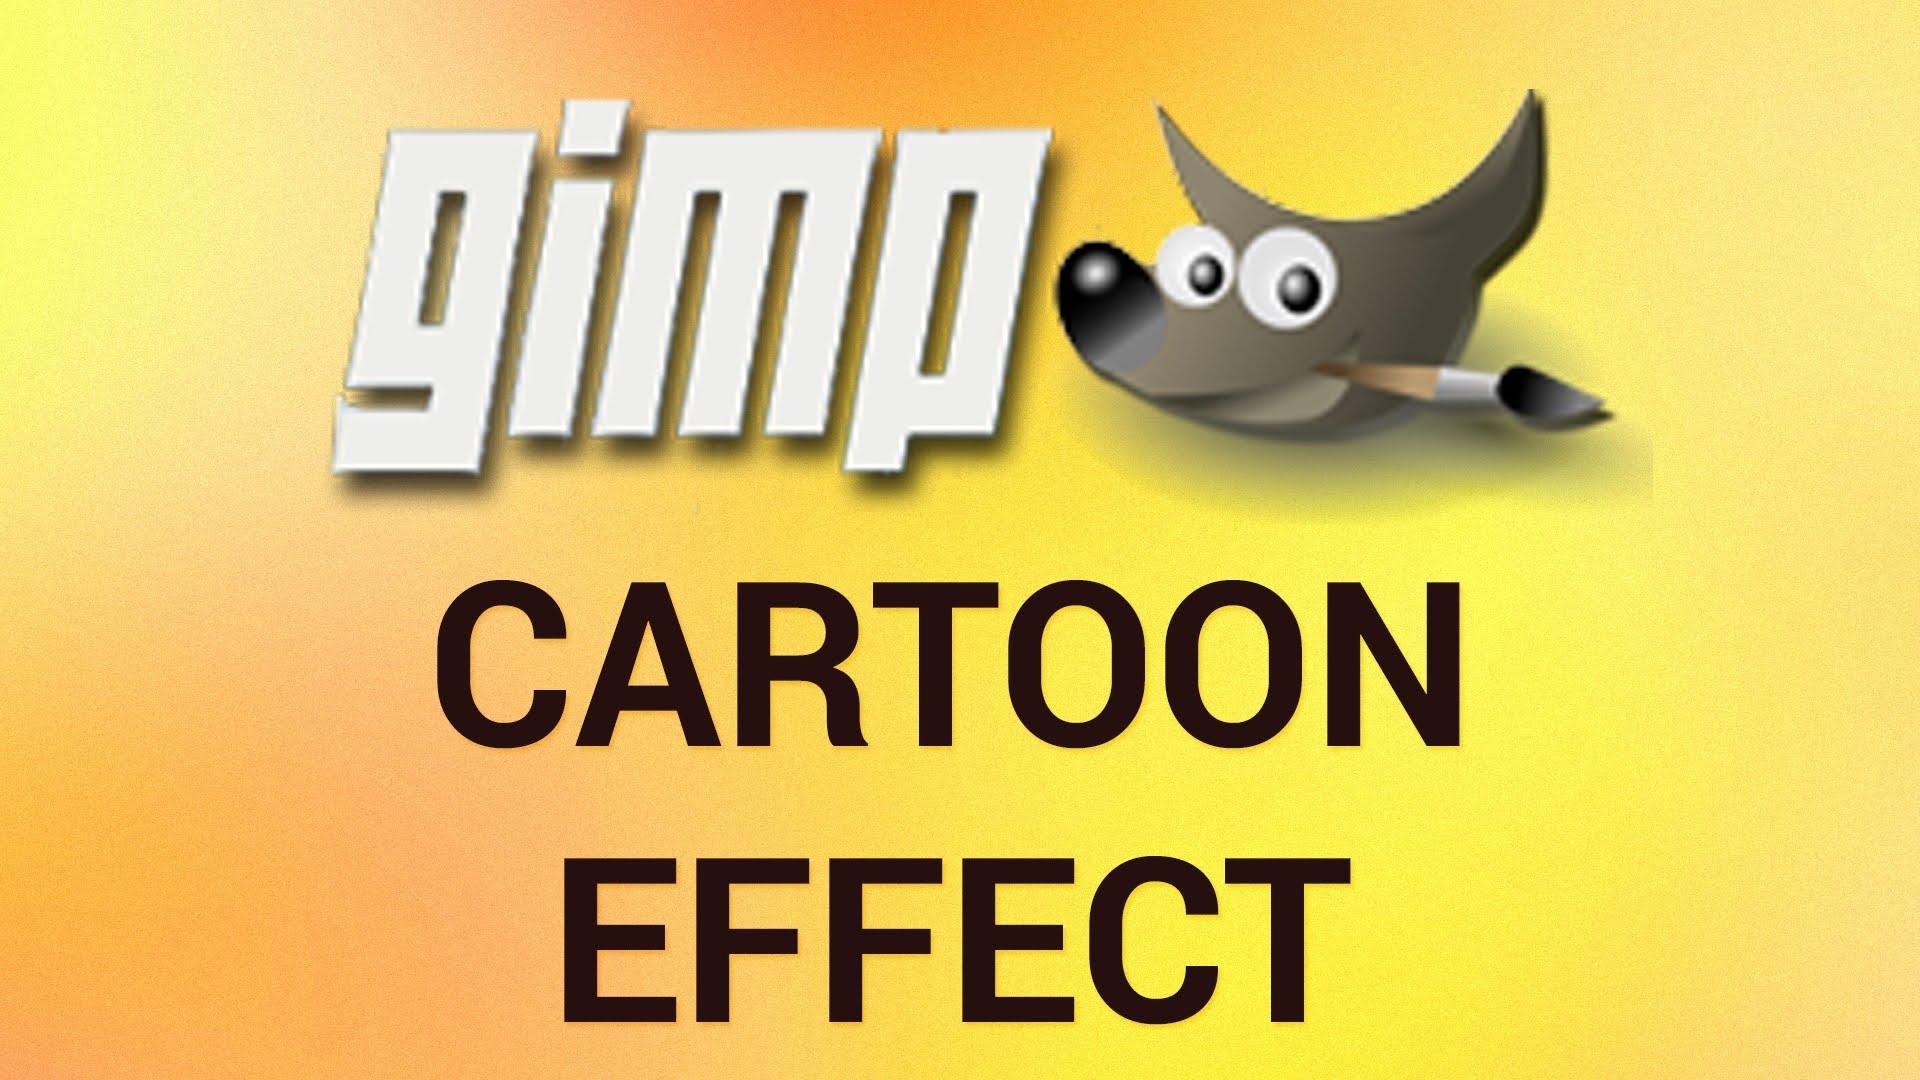 Gimp clipart #4, Download drawings